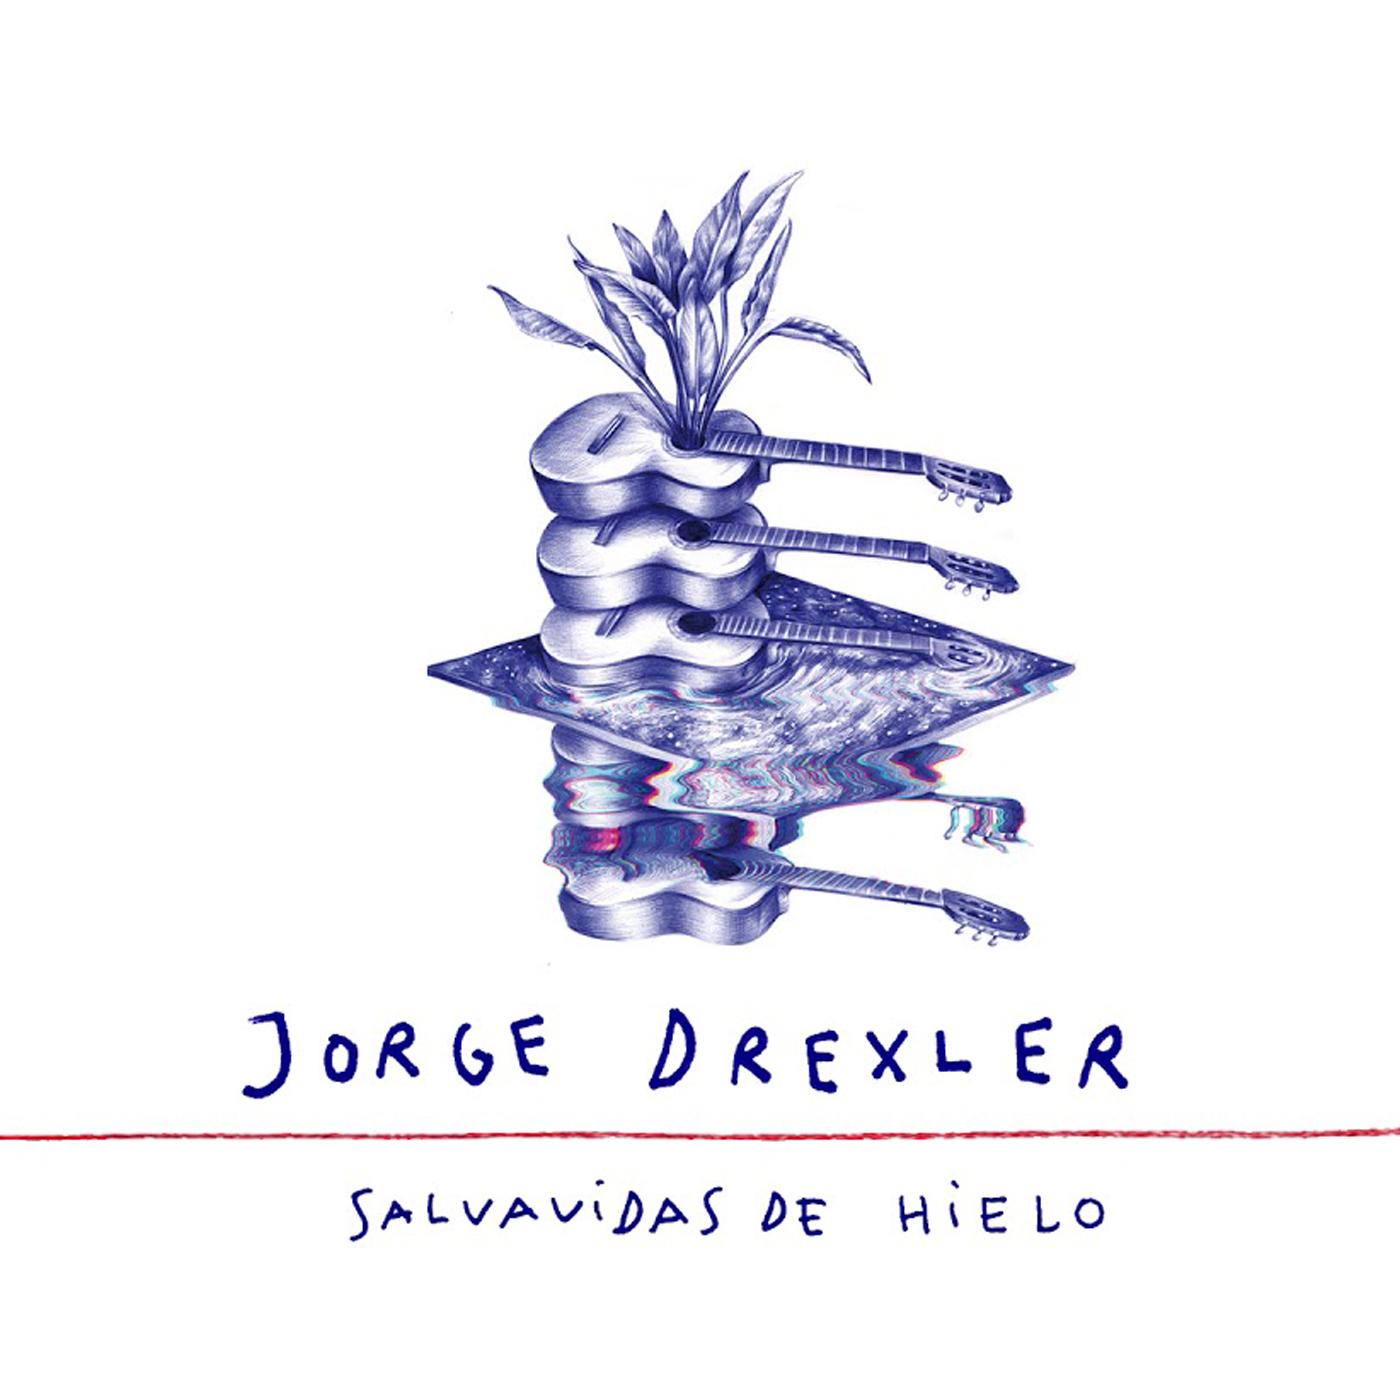 Jorge Drexler Natalia Lafourcade Salvavidas de hielo Single